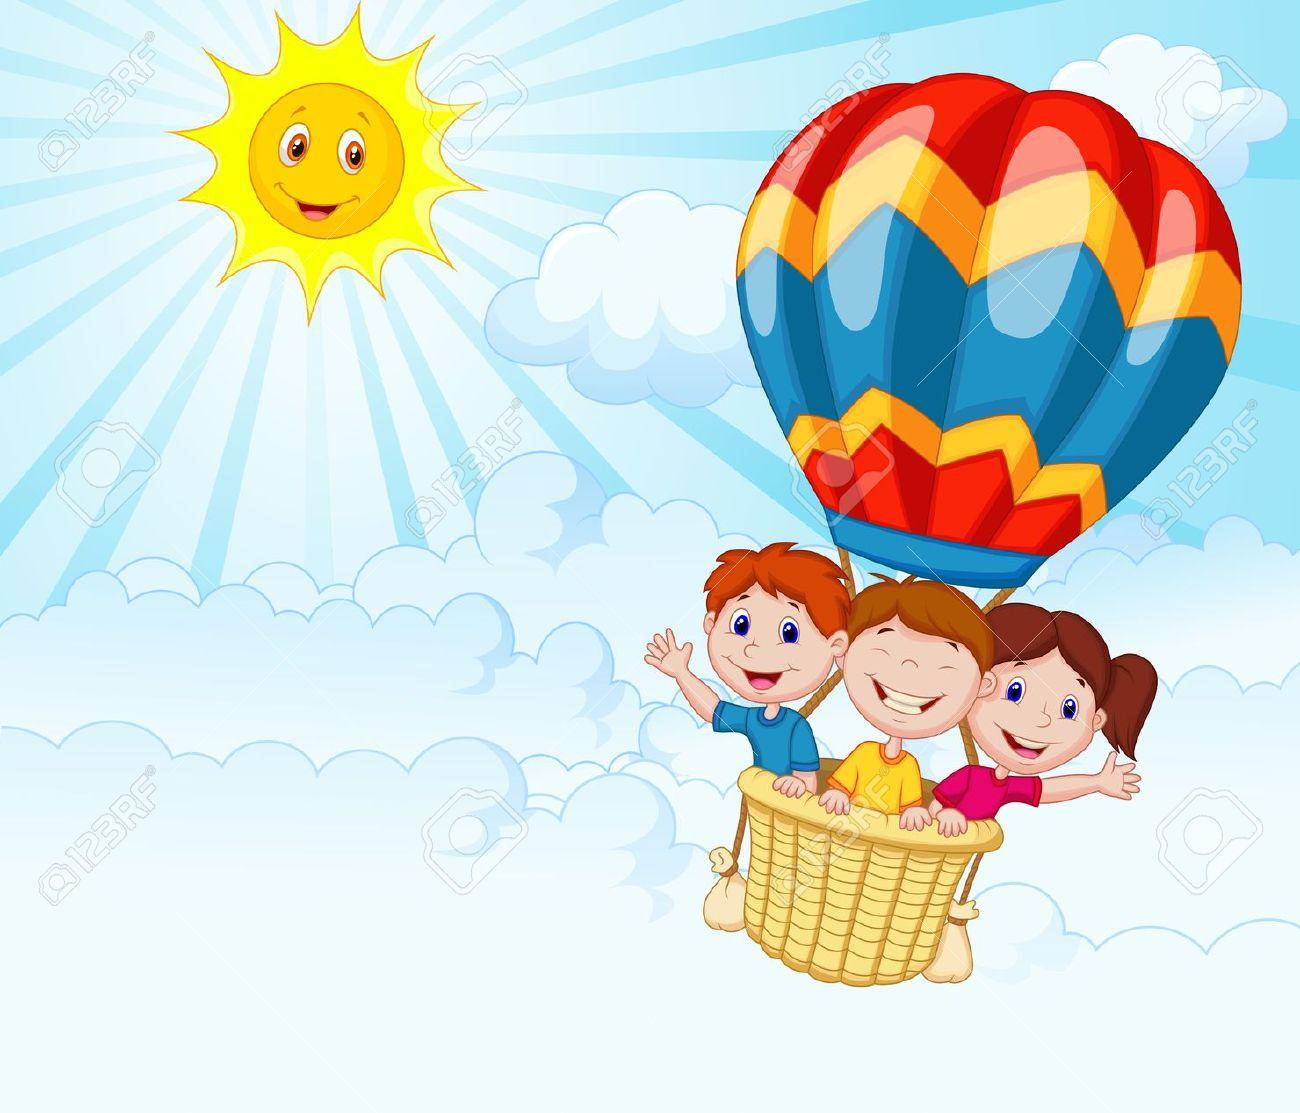 Happy Kids Riding A Hot Air Balloon Royalty Free Cliparts, Vectors.